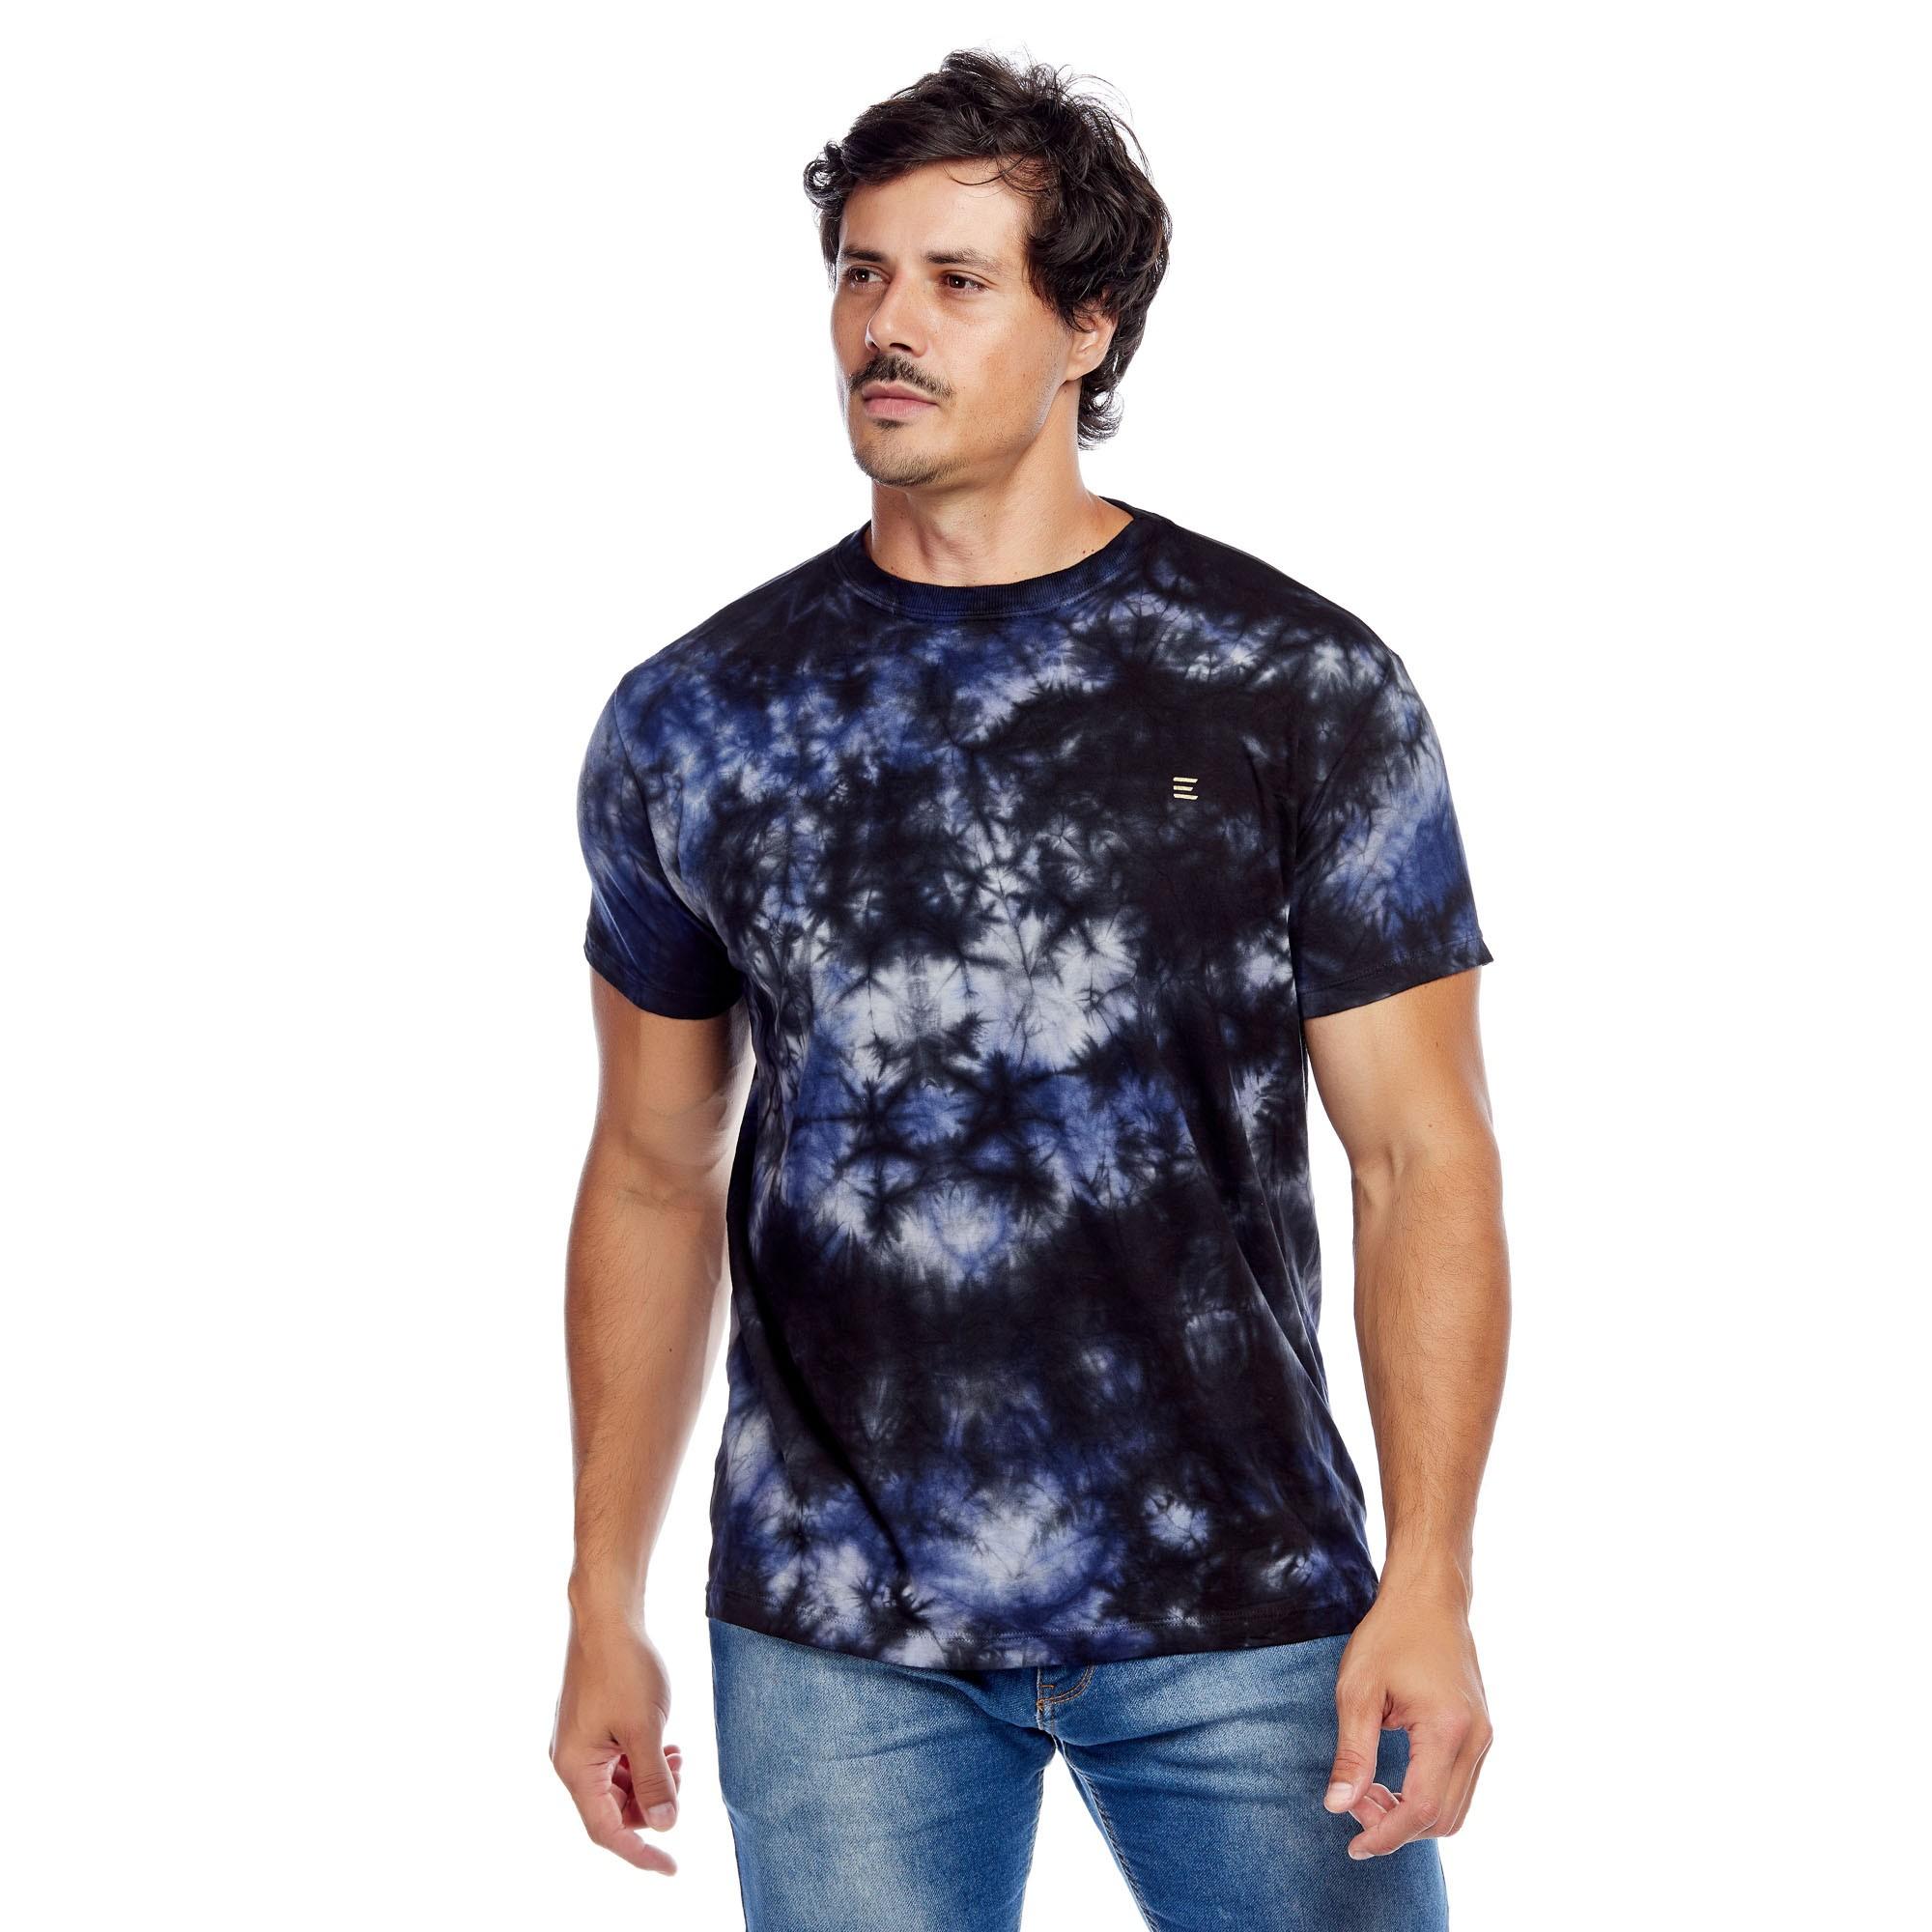 Camiseta Masculina Tie Dye Evolvee